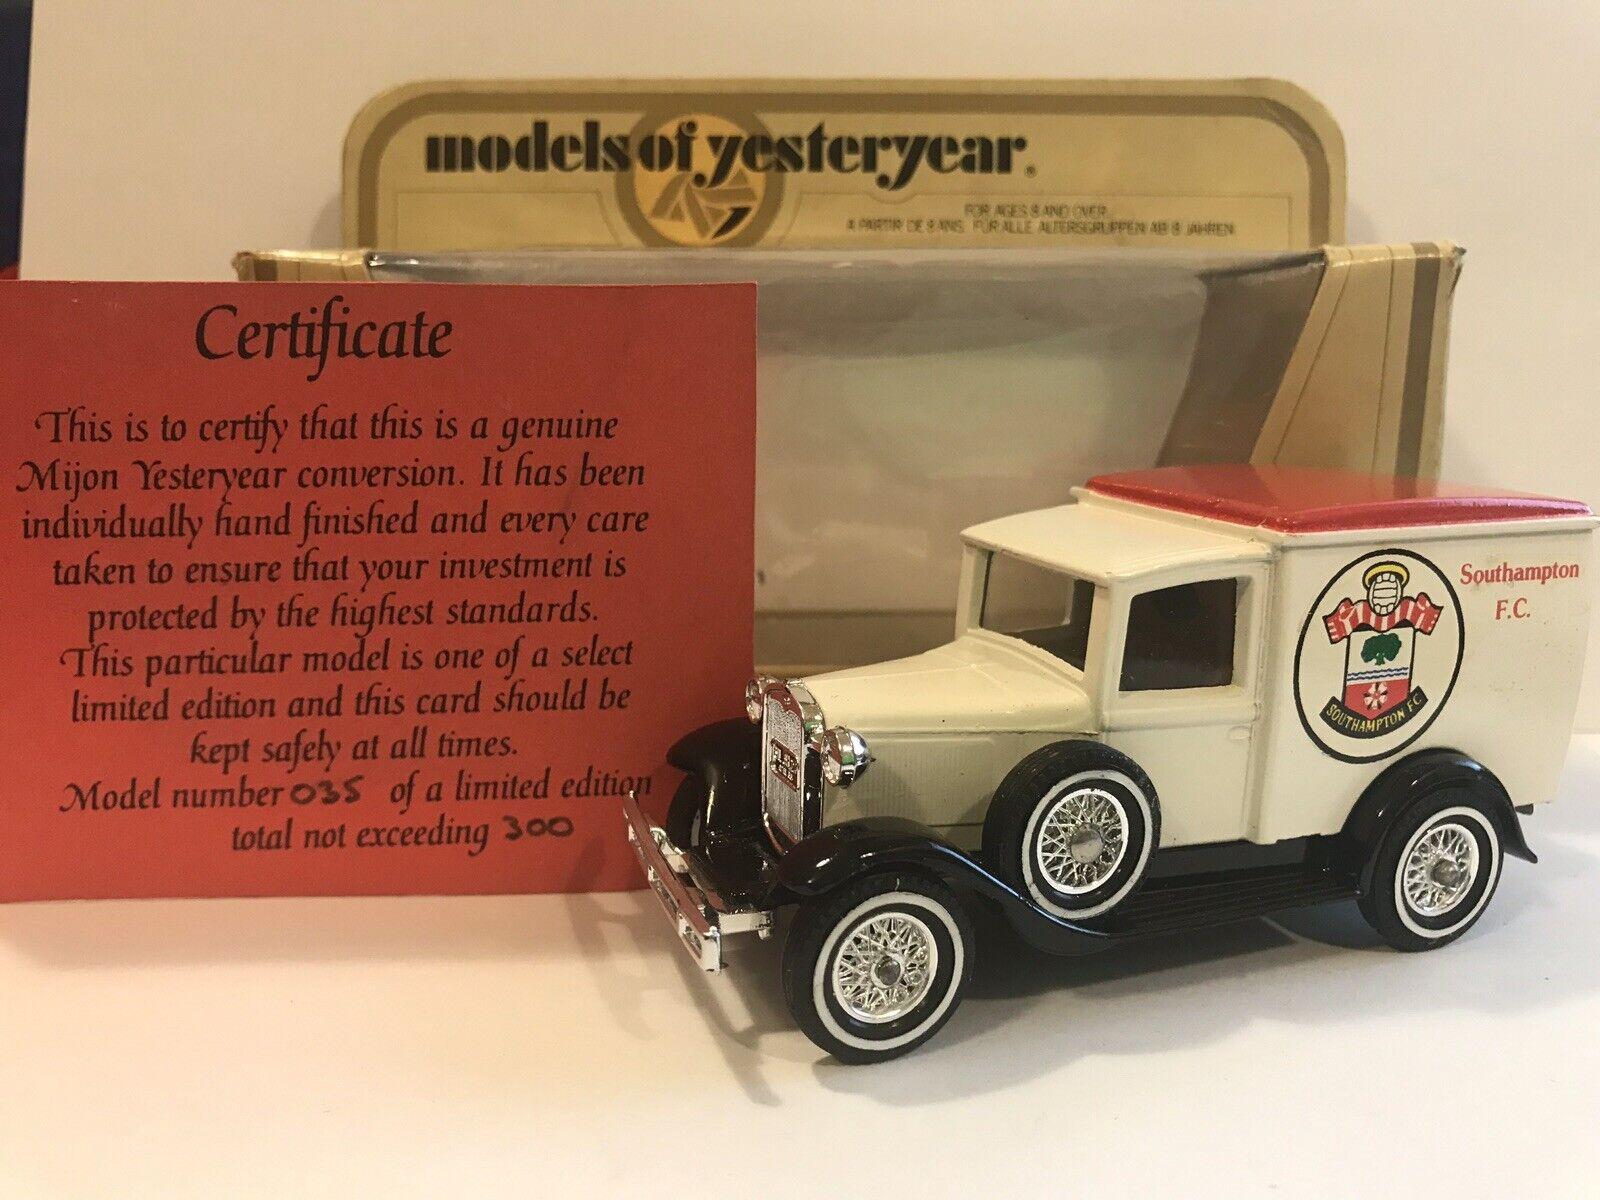 risparmia fino al 30-50% di sconto modellos OF YESTERYEAR Y-22 1930 Ford a Southampton Footbtutti Club Club Club mijon RARE Limited 35 300  risparmia fino al 50%